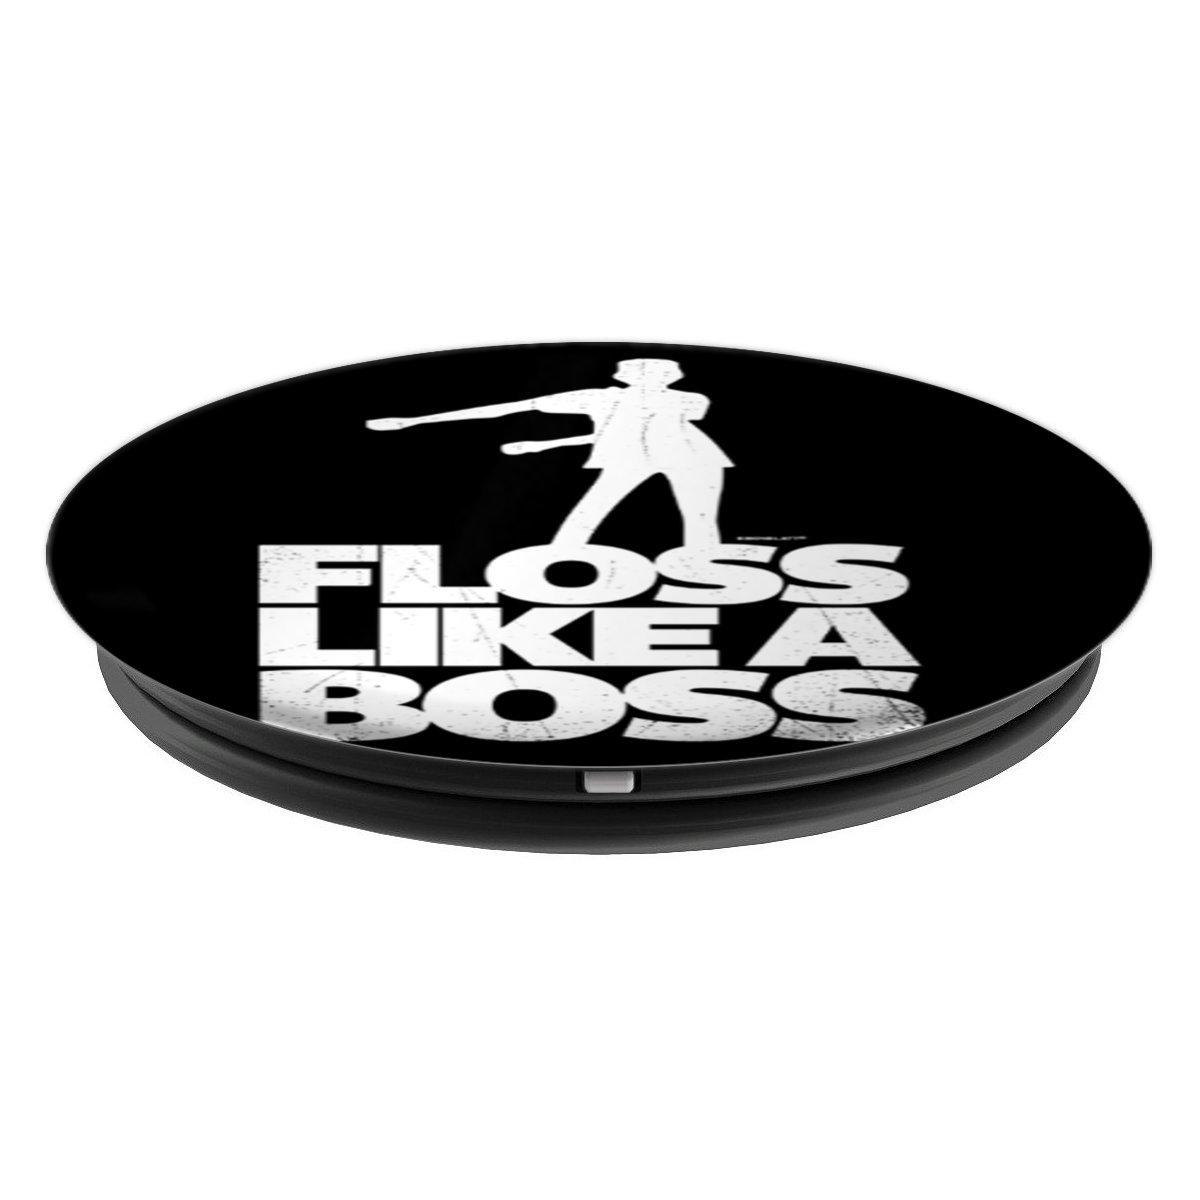 Amazon.com: Hilo Dental Floss Dance Like A Boss Pop Socket ...